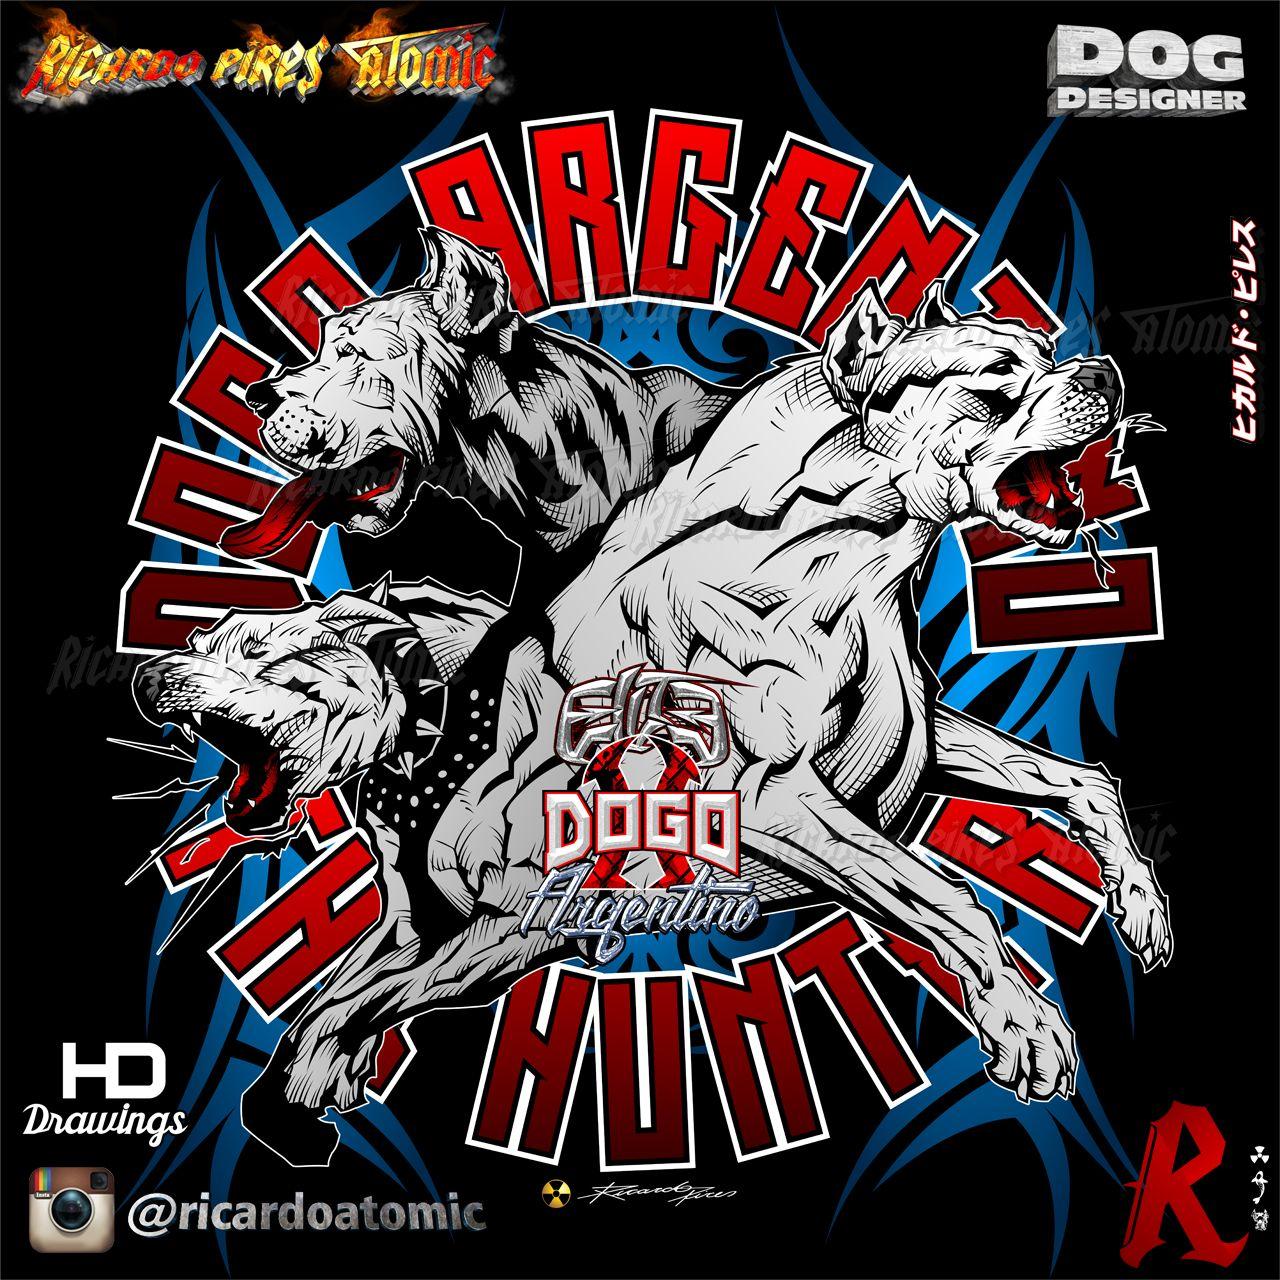 Dogo Argentino The Hunter Elite Dogo Argentino The Hunter Dogo Argentino Designs By Ricardo Pires Ricardoatomic Do Dogo Argentino Bulldog Mascot Sketch Design